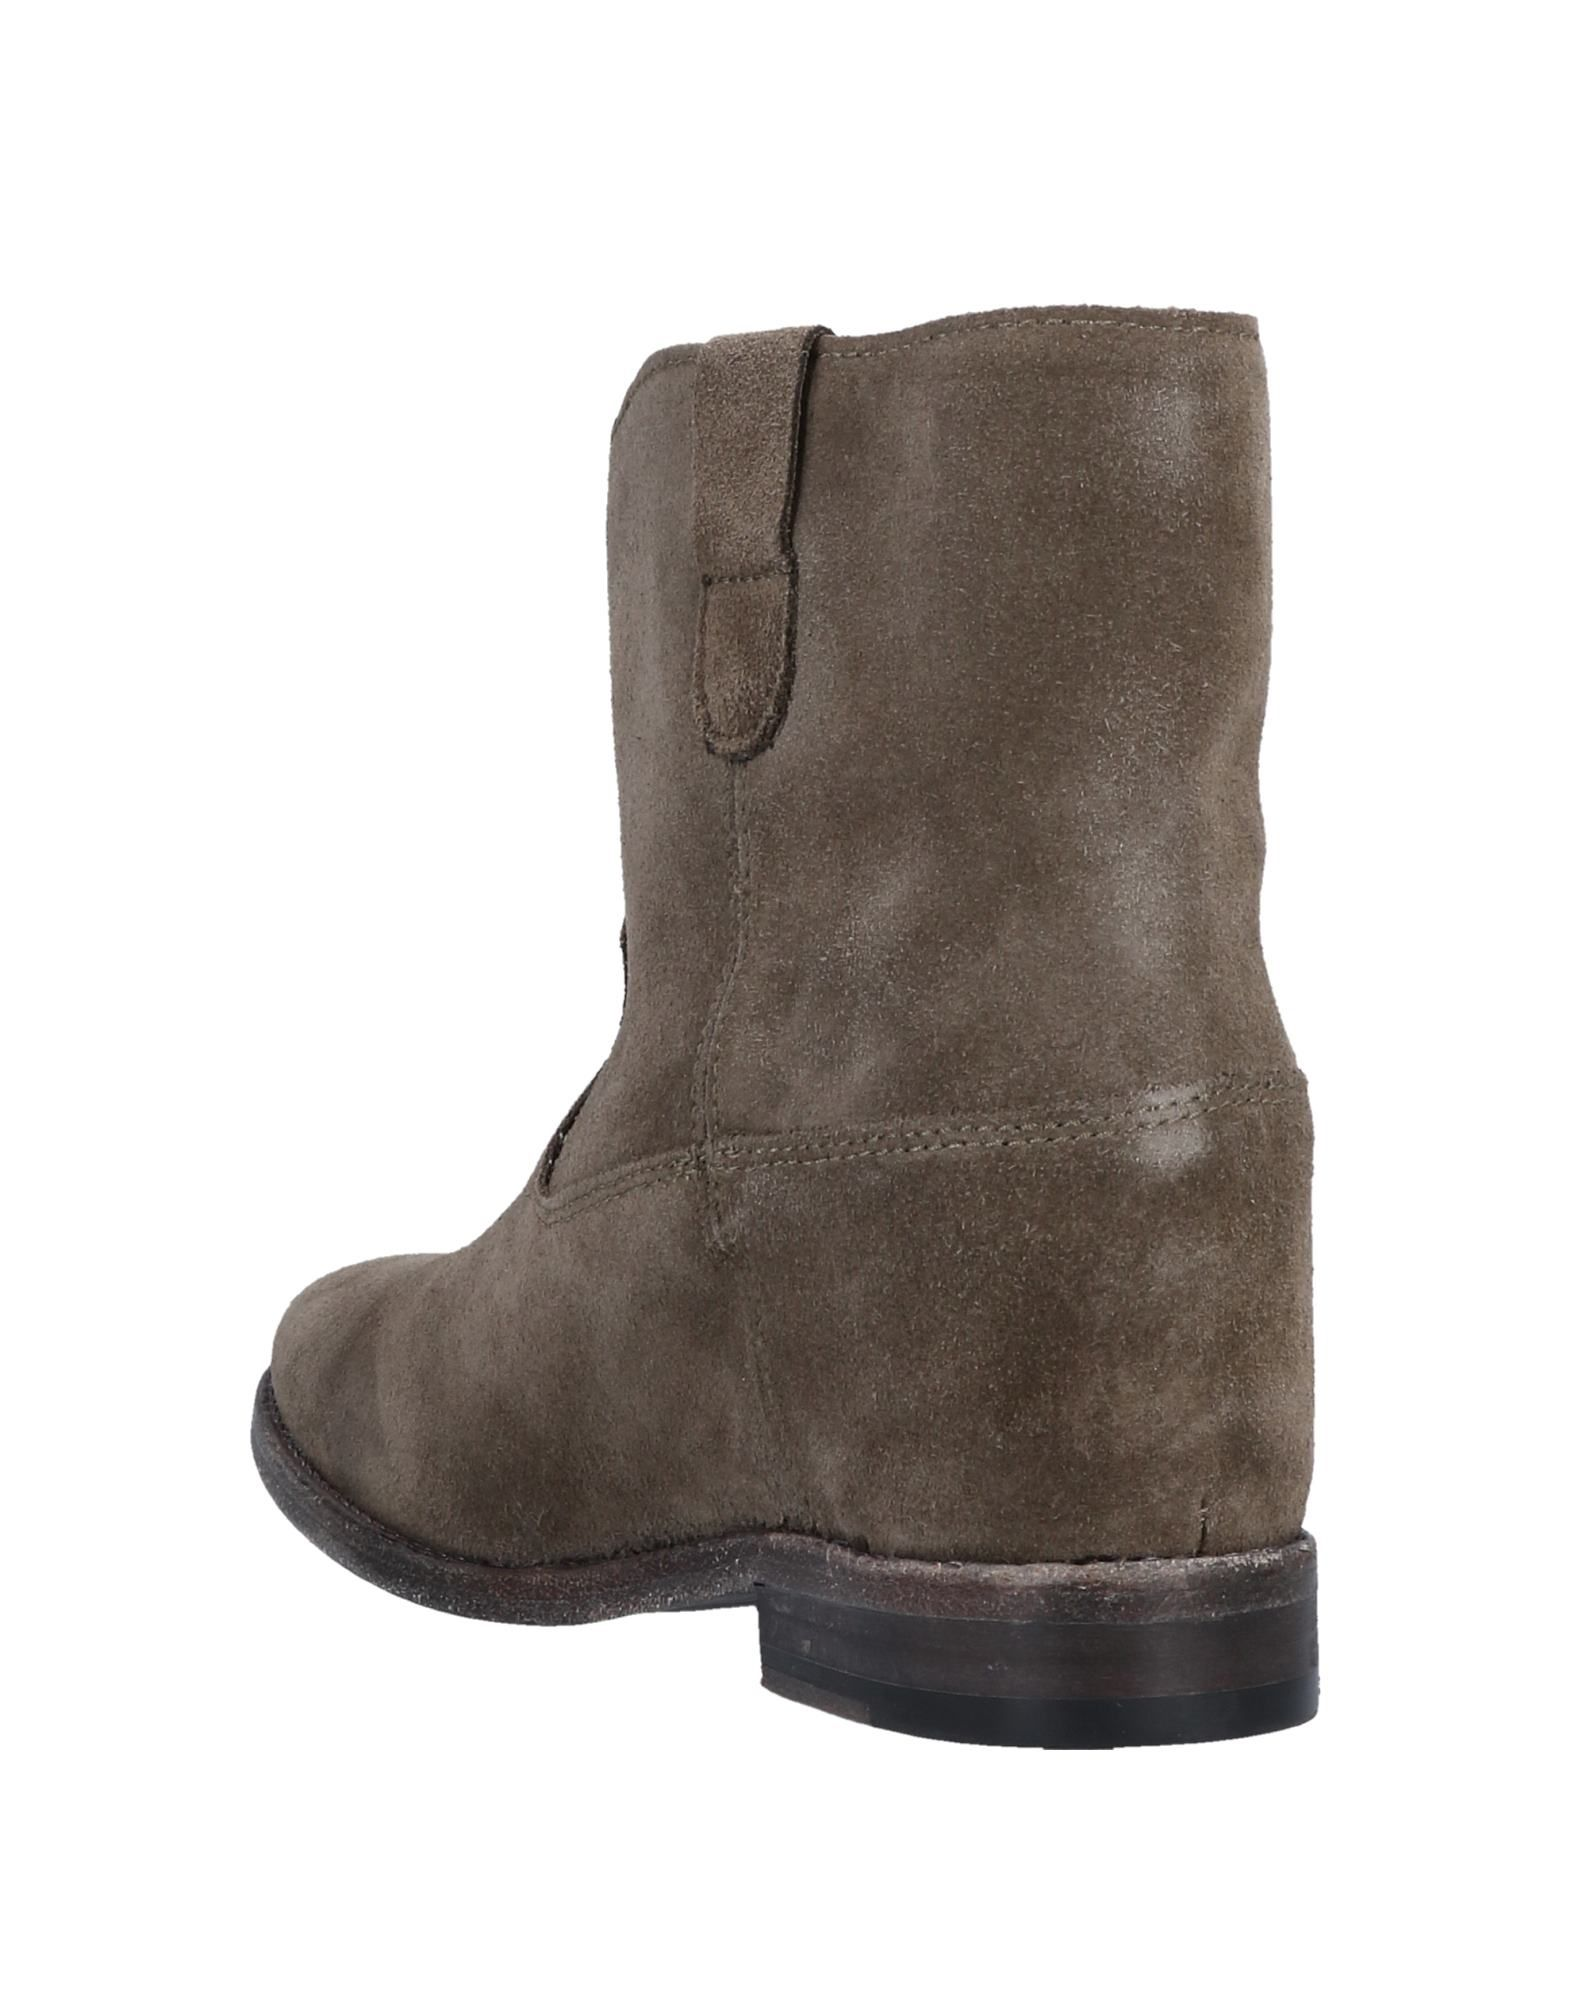 Catarina Martins Ankle Boot - Women Catarina Catarina Catarina Martins Ankle Boots online on  United Kingdom - 11572215JE 2ba47f